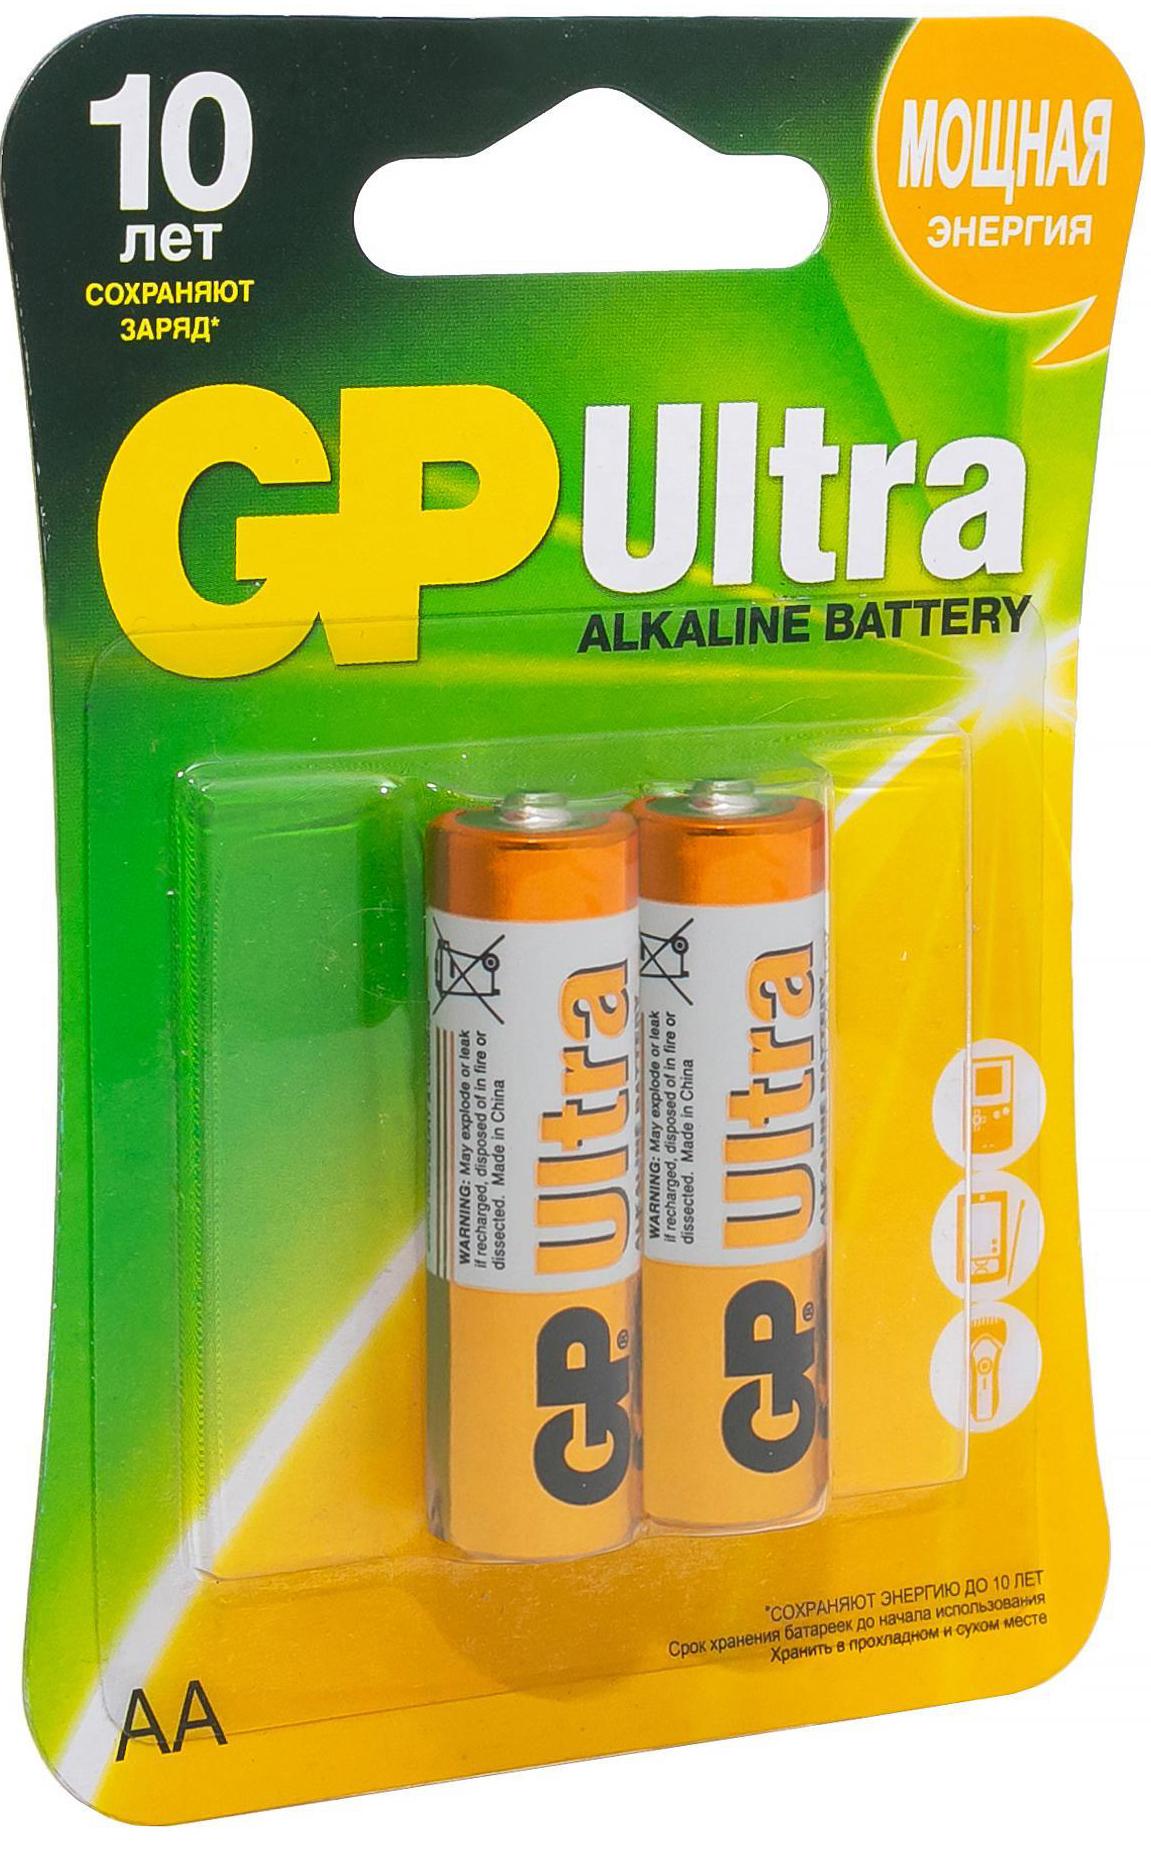 Фото - Элемент питания GP 15AU (LR6) (Блистер, 2 шт) Ultra алкалиновые батарейки gp ultra alkaline 13а типоразмера d блистер 2 шт